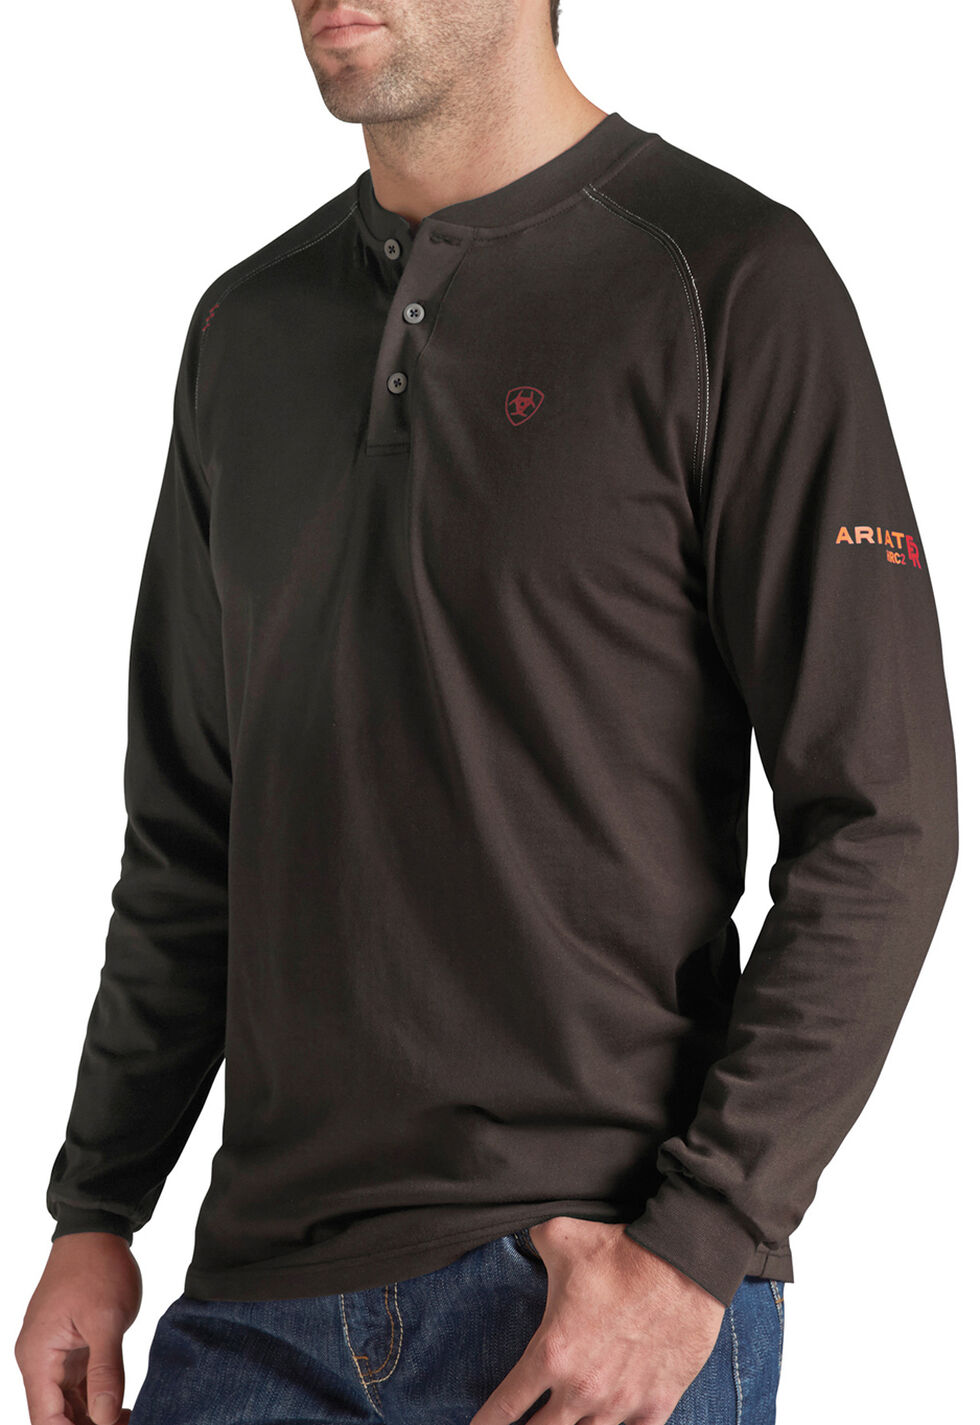 Ariat Men's Flame-Resistant Coffee Bean Henley Work Shirt, Coffee, hi-res